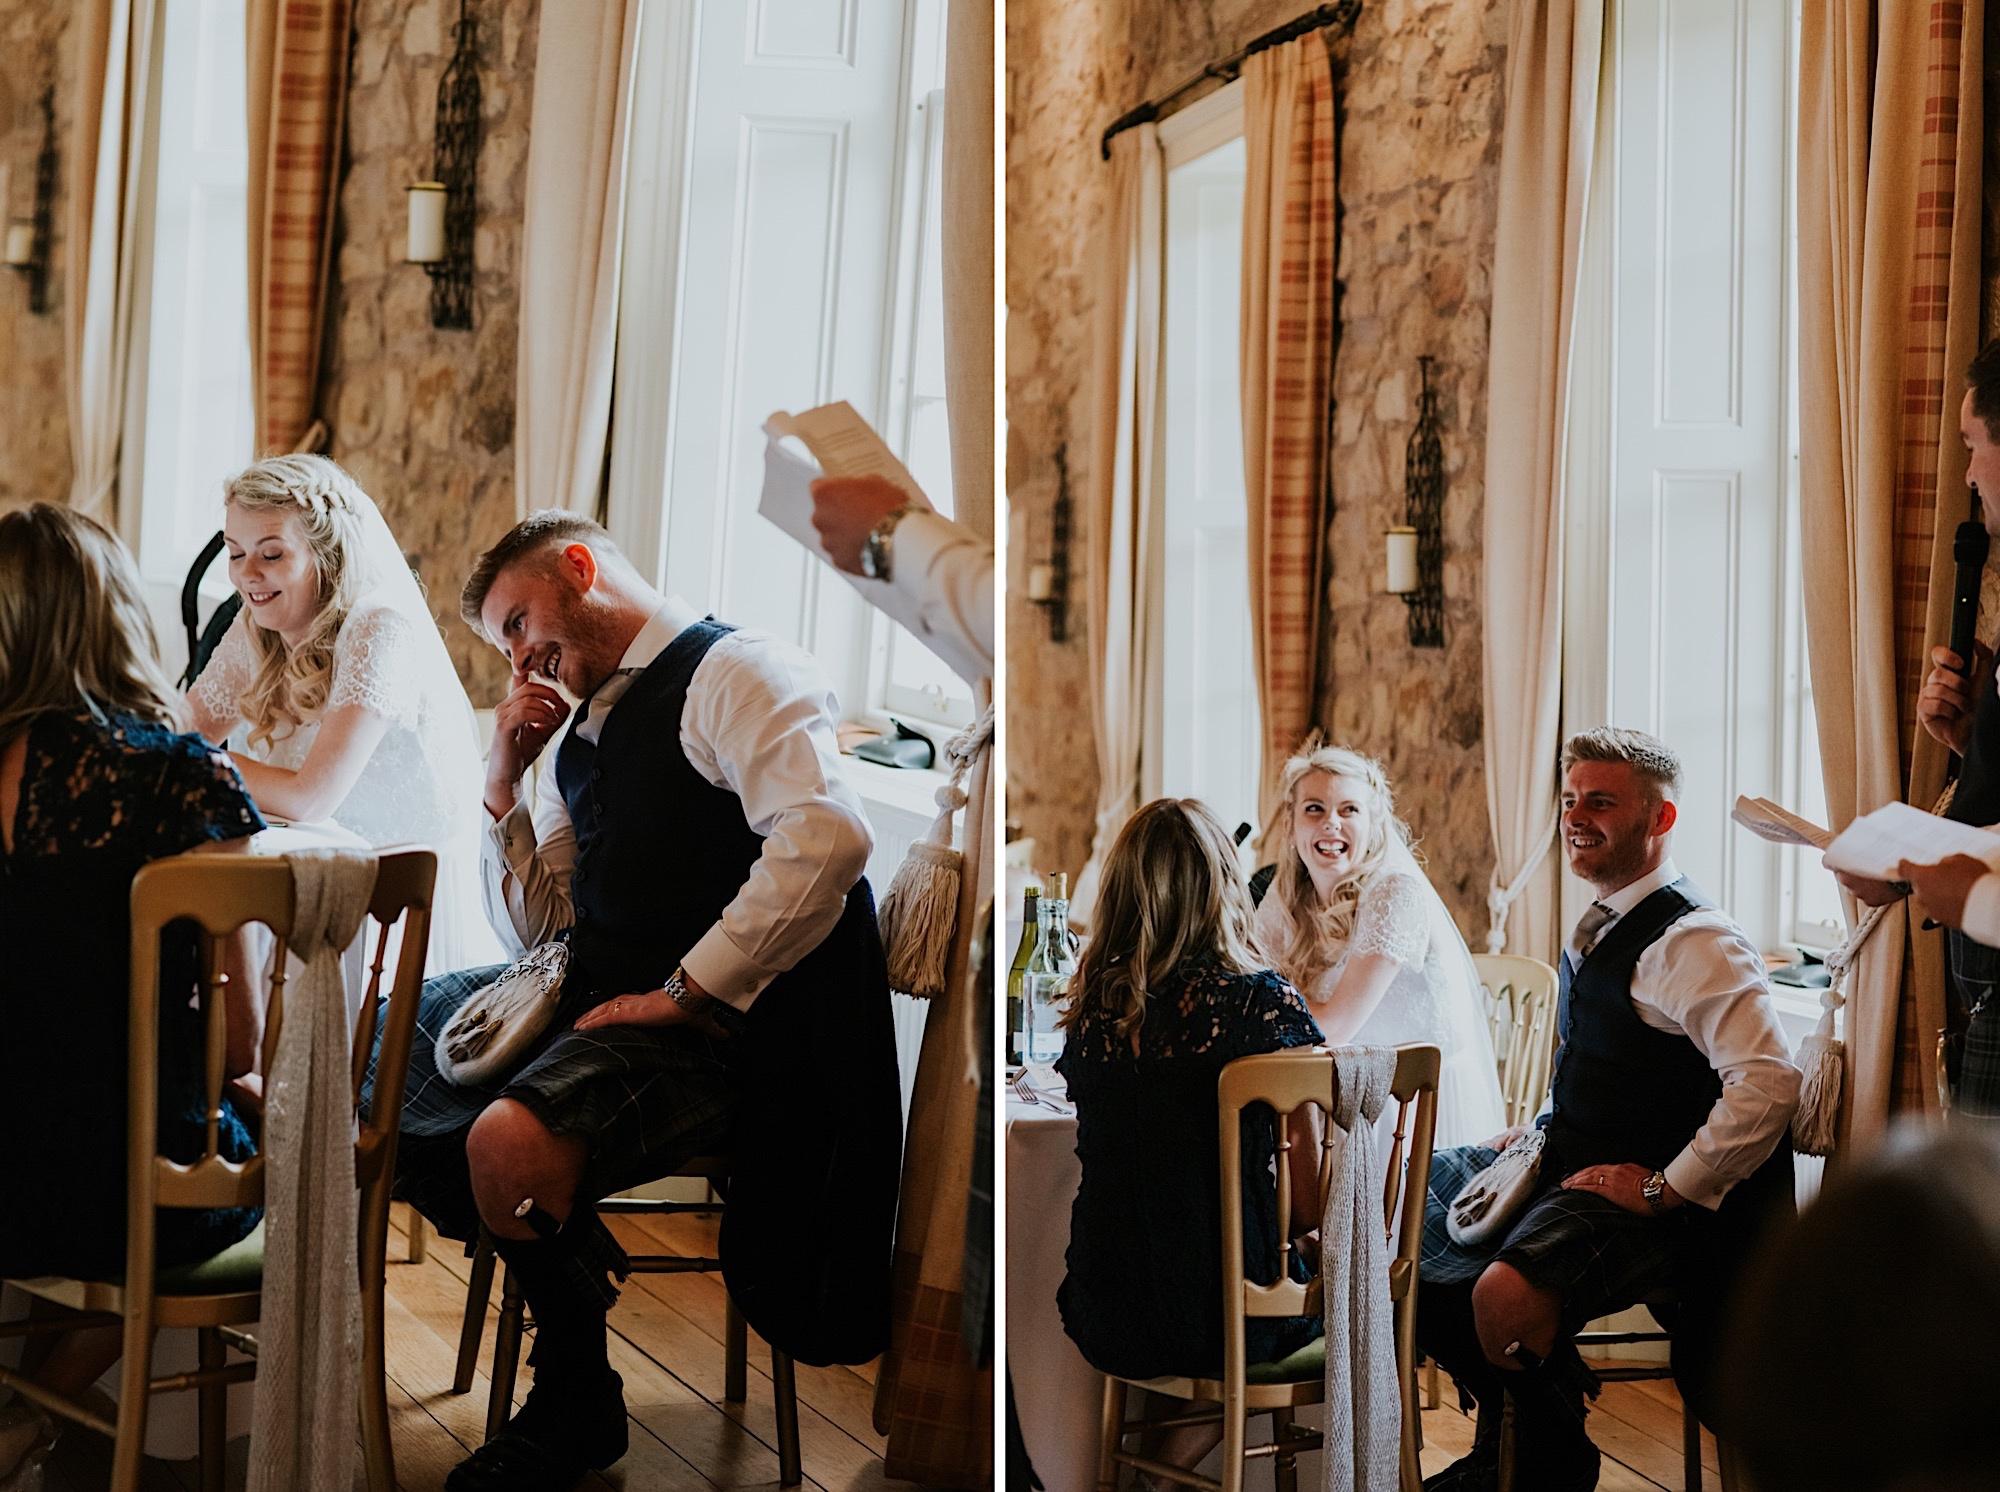 kirknewton stables wedding venue